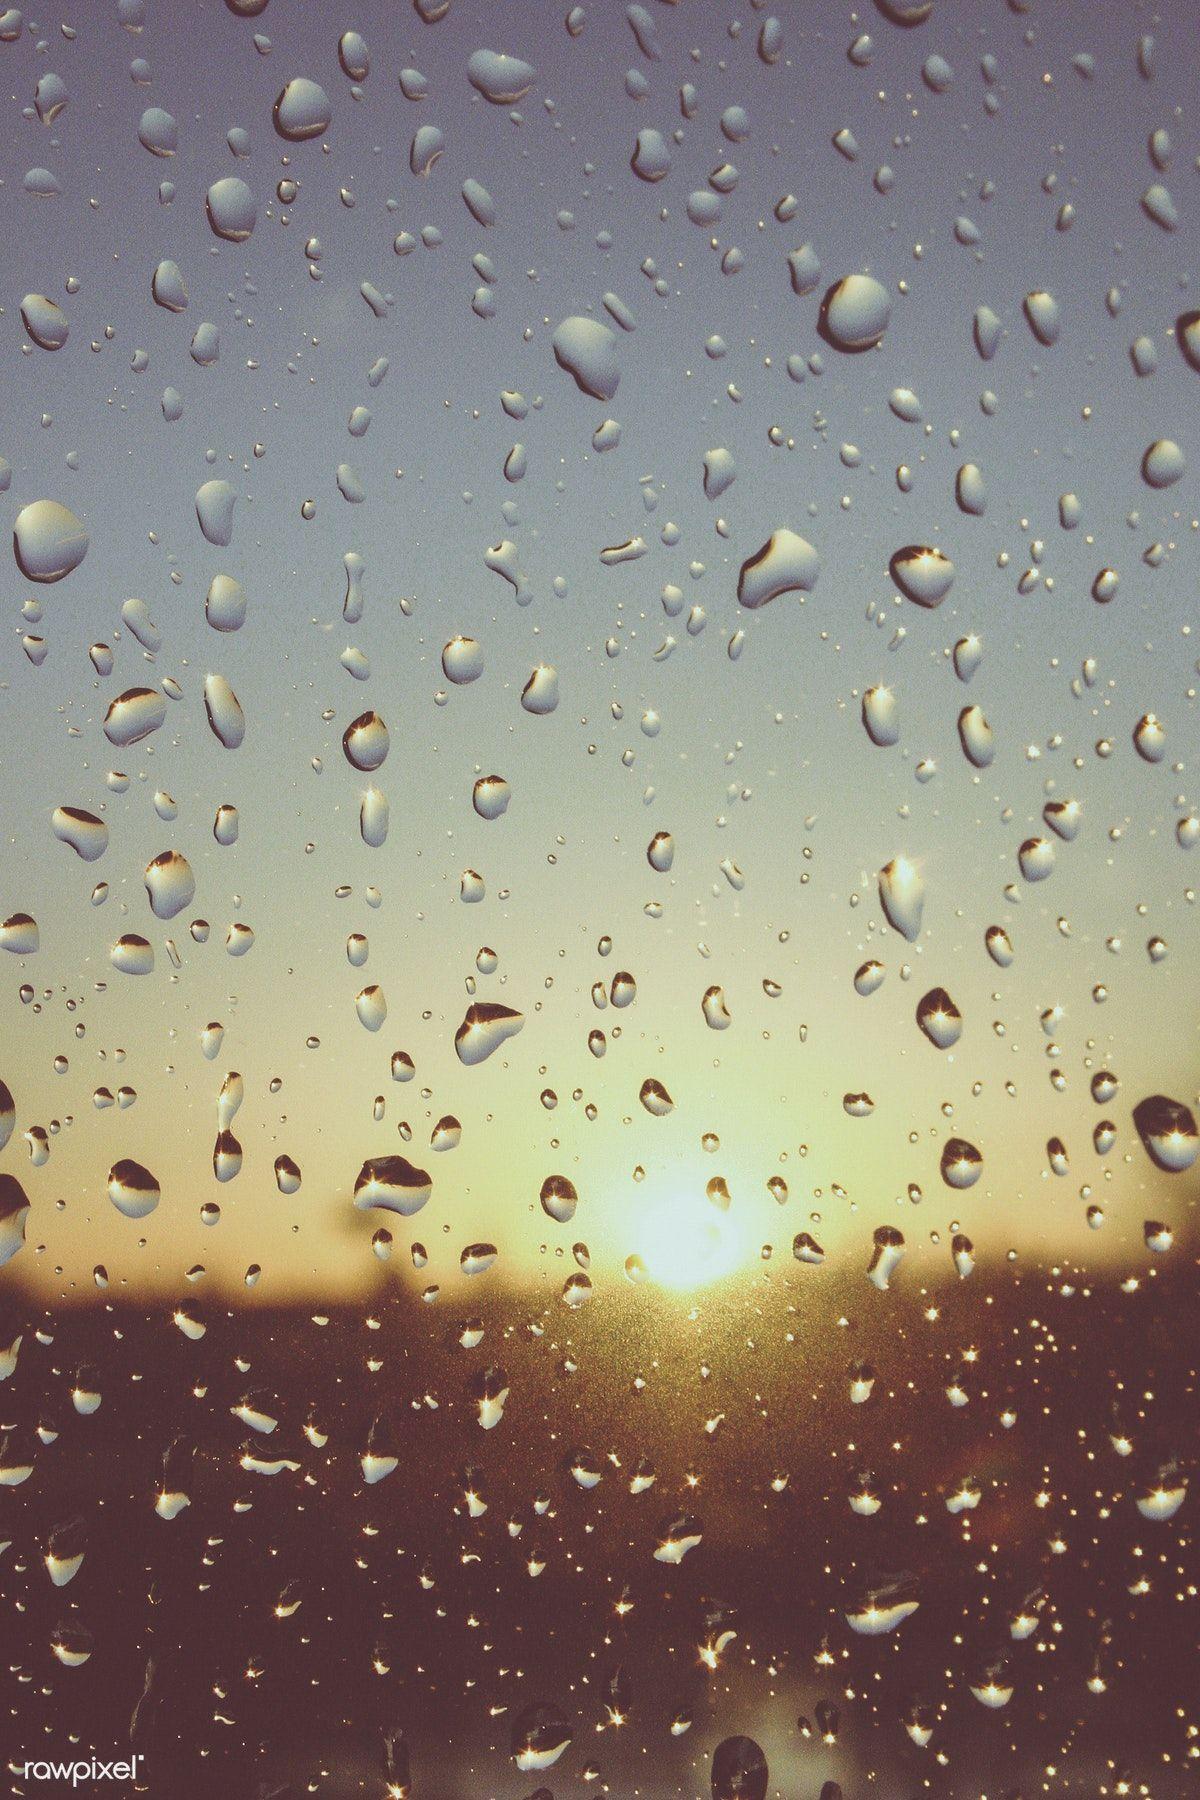 Raindrops On Window Pane Free Image By Rawpixel Com Rain Drops On Window Rain Drops Rain Window